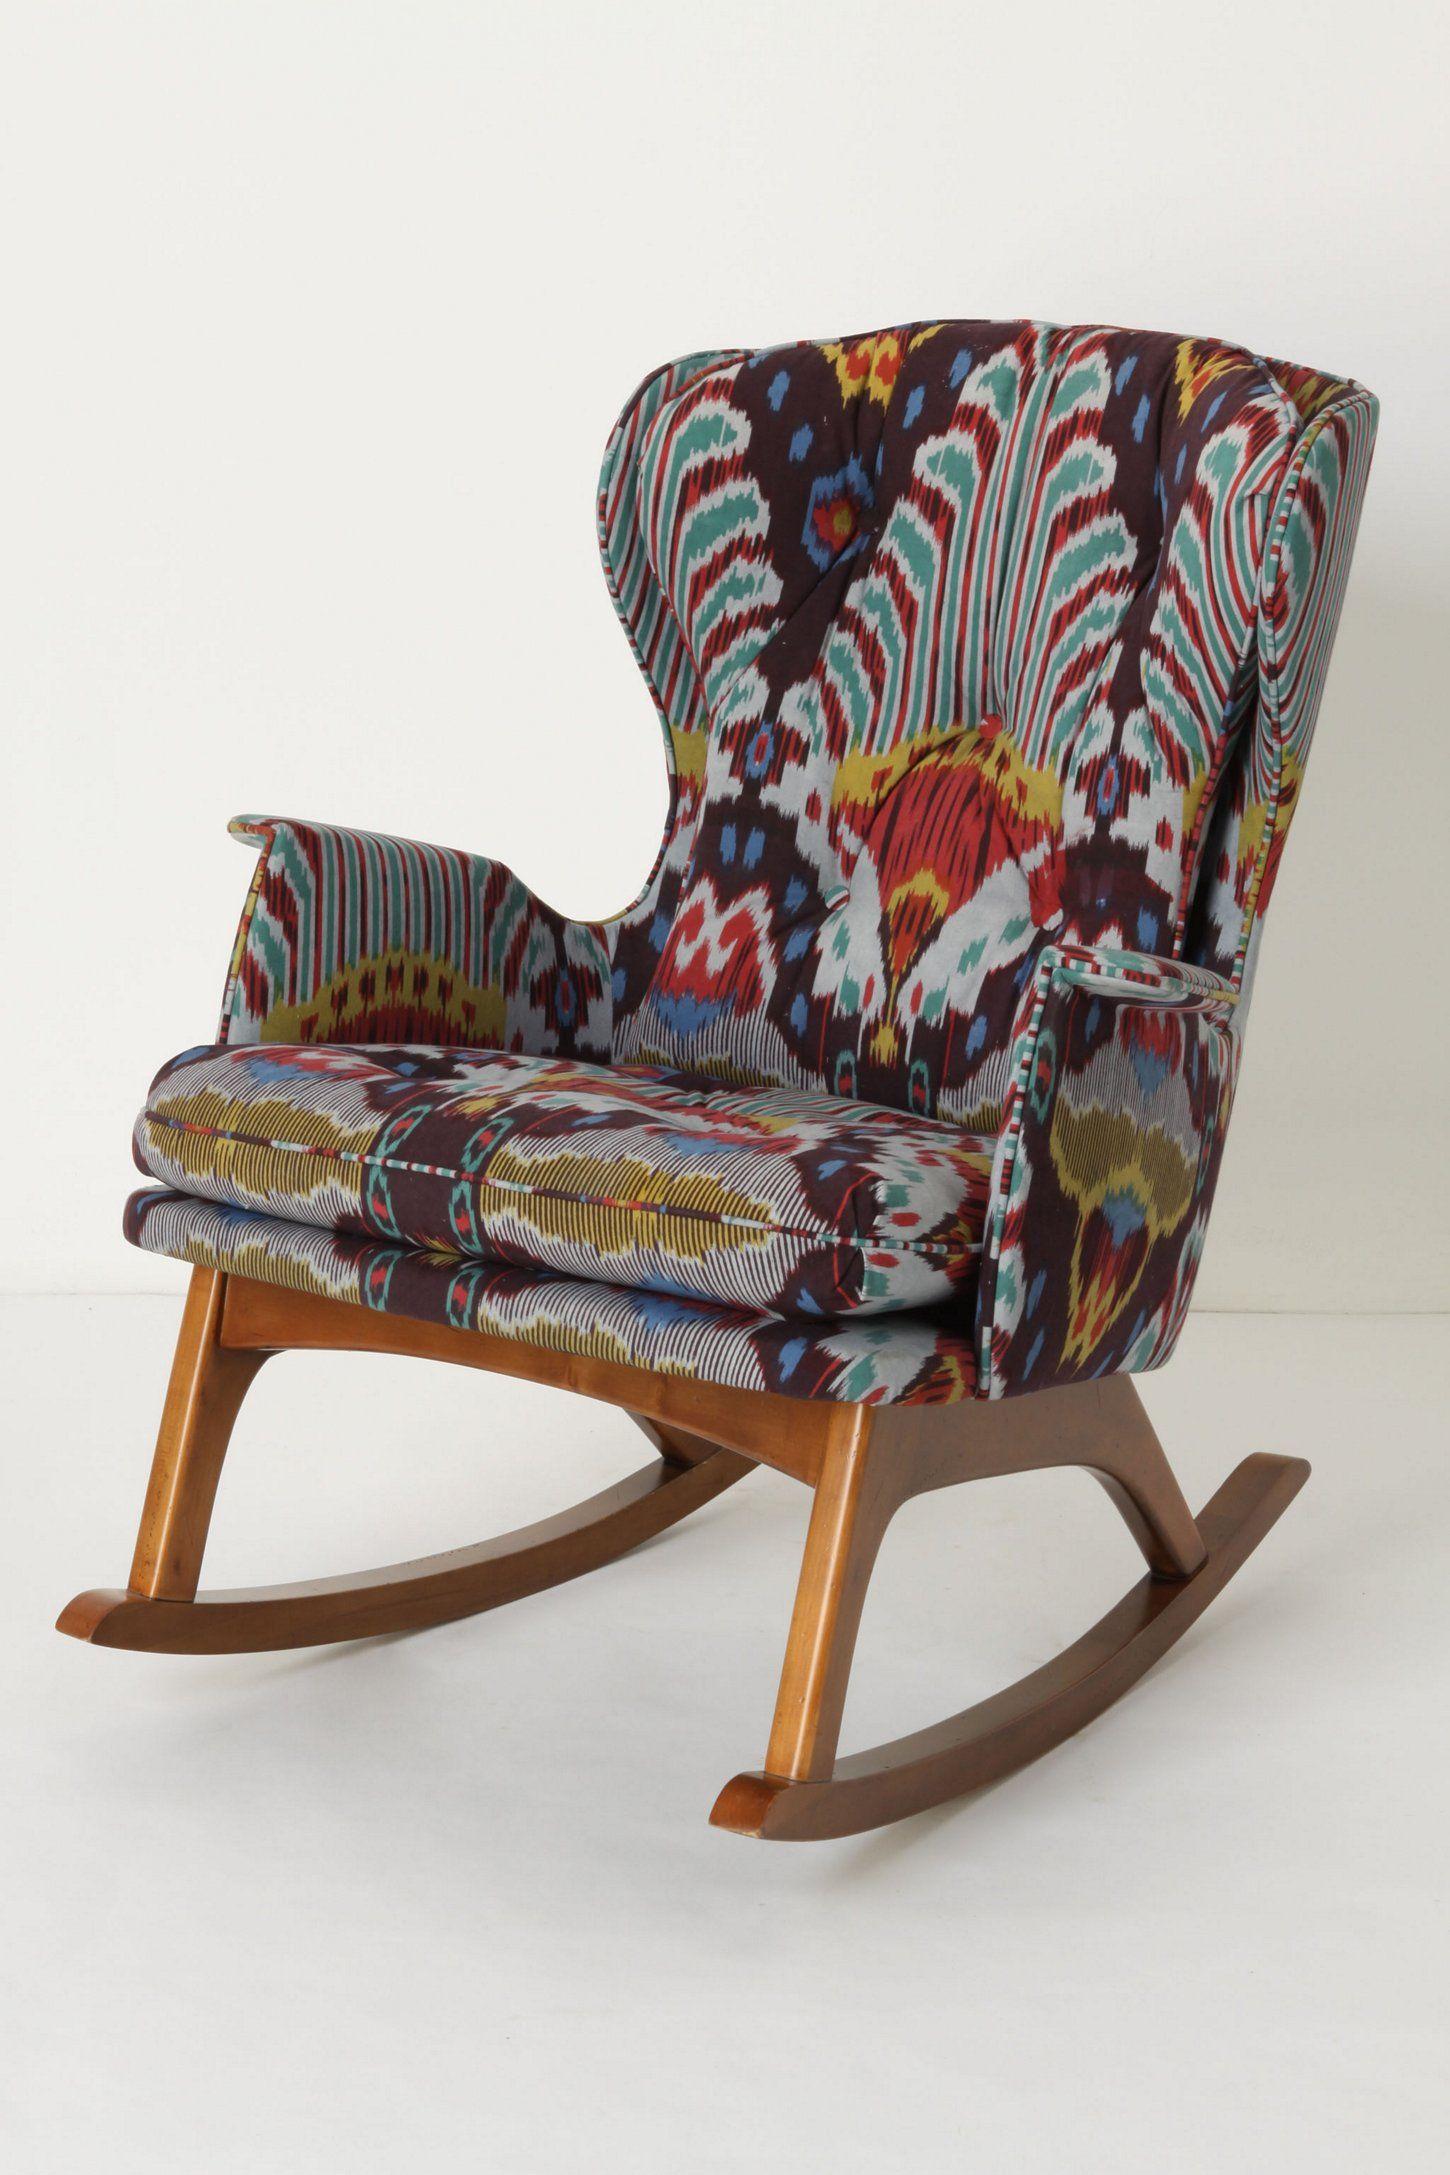 Finn Rocker Anthropologie Furniture Home Decor Accessories